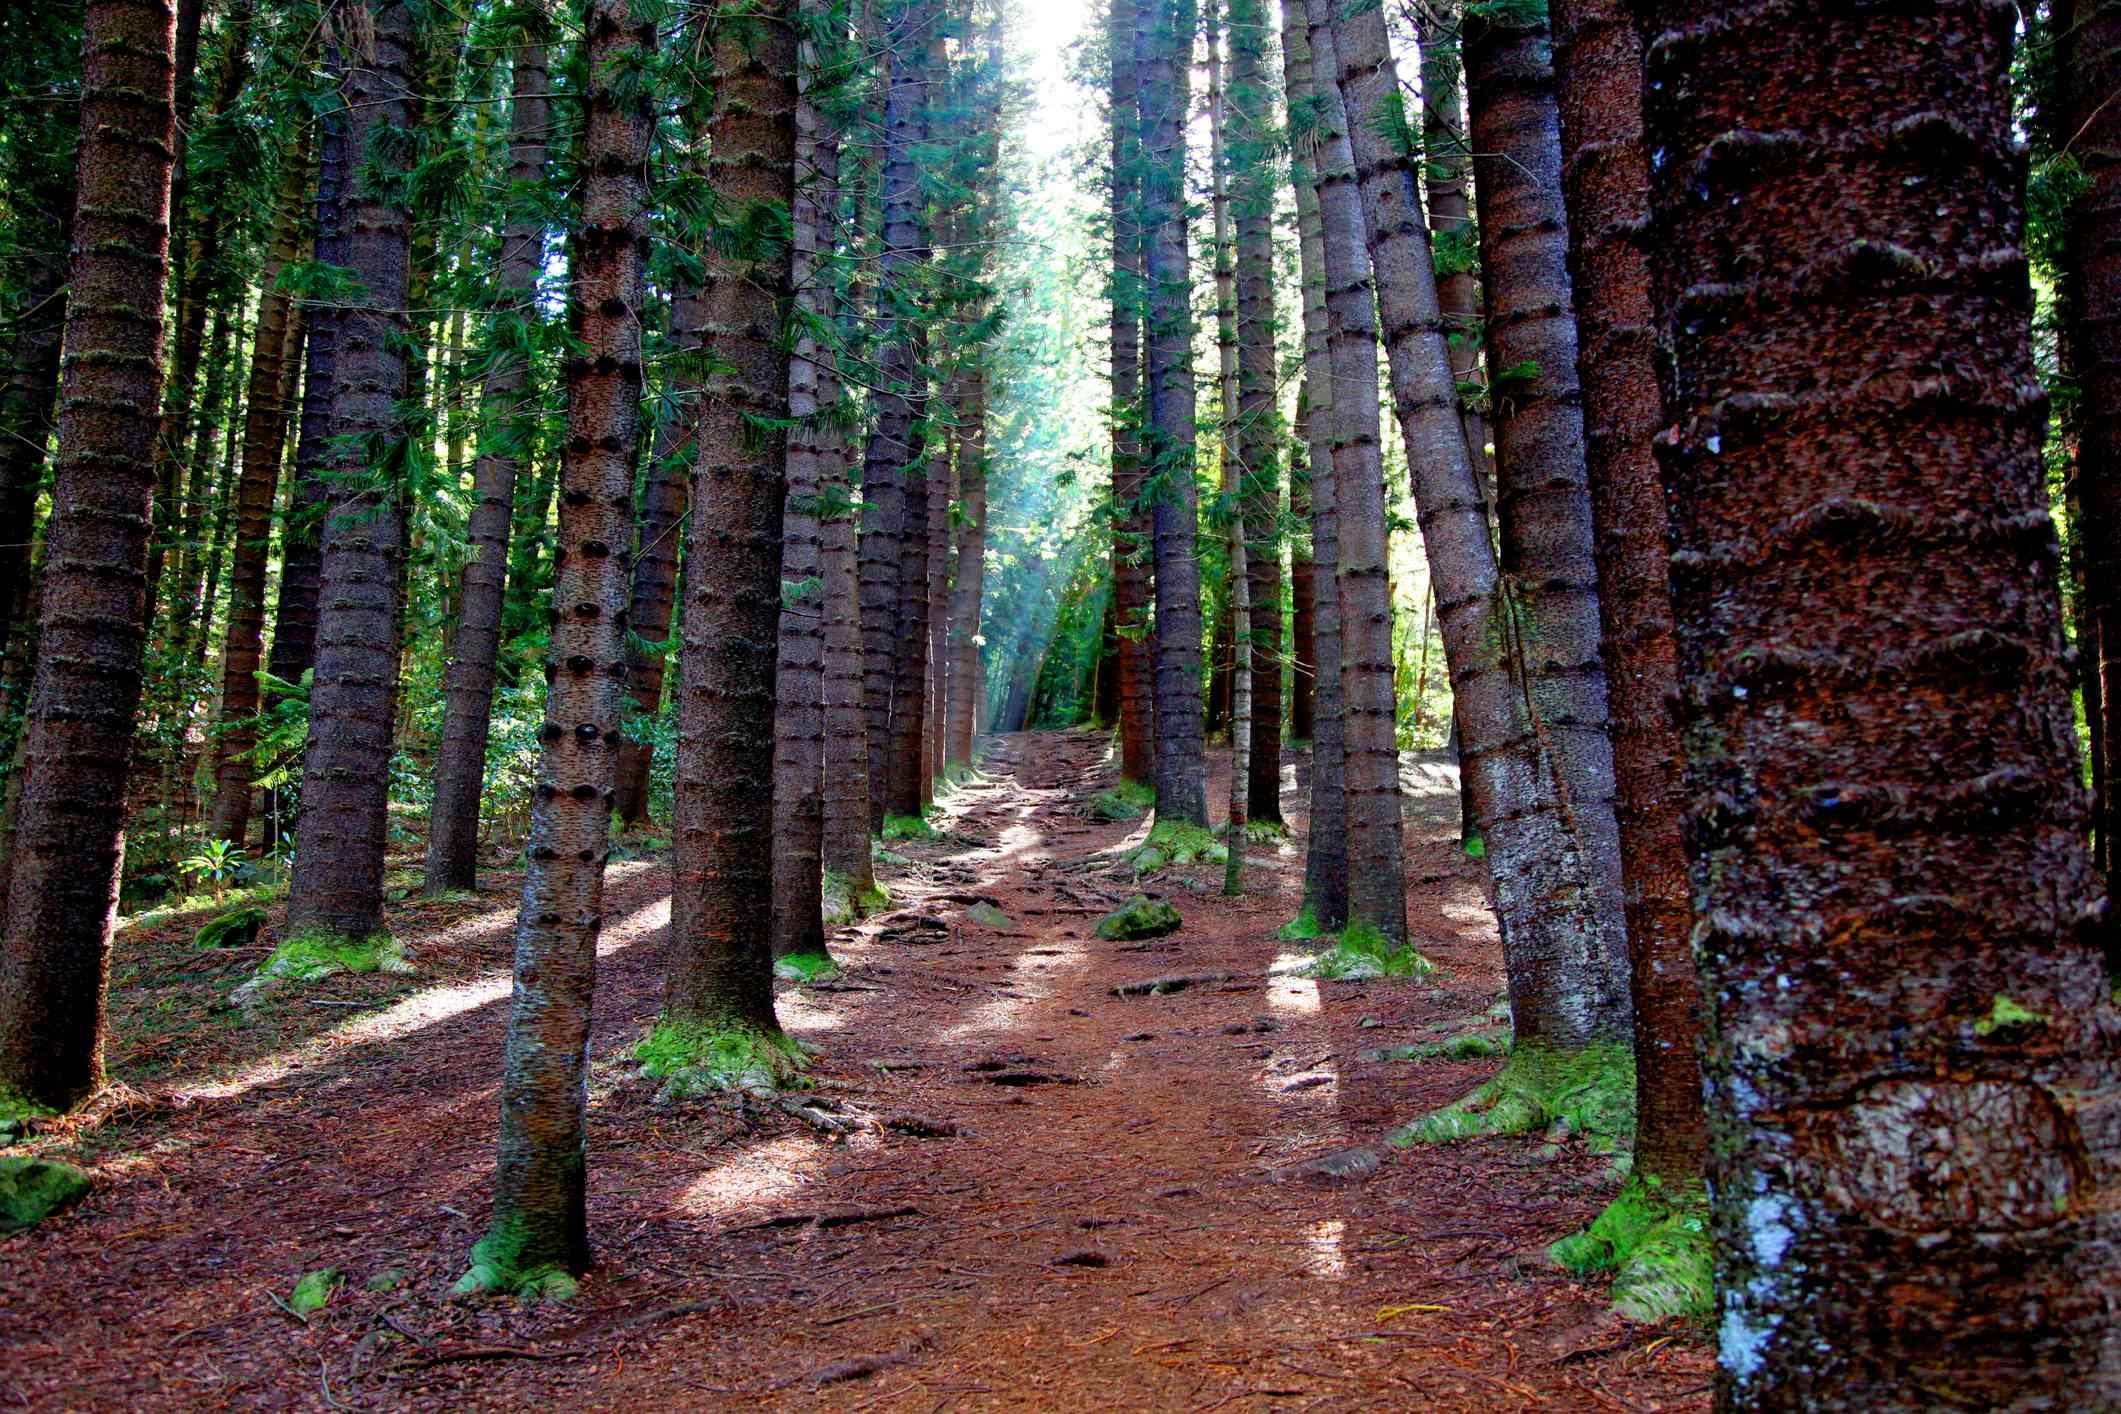 Pine forest on Sleeping Giant trail in Kauai Hawaii